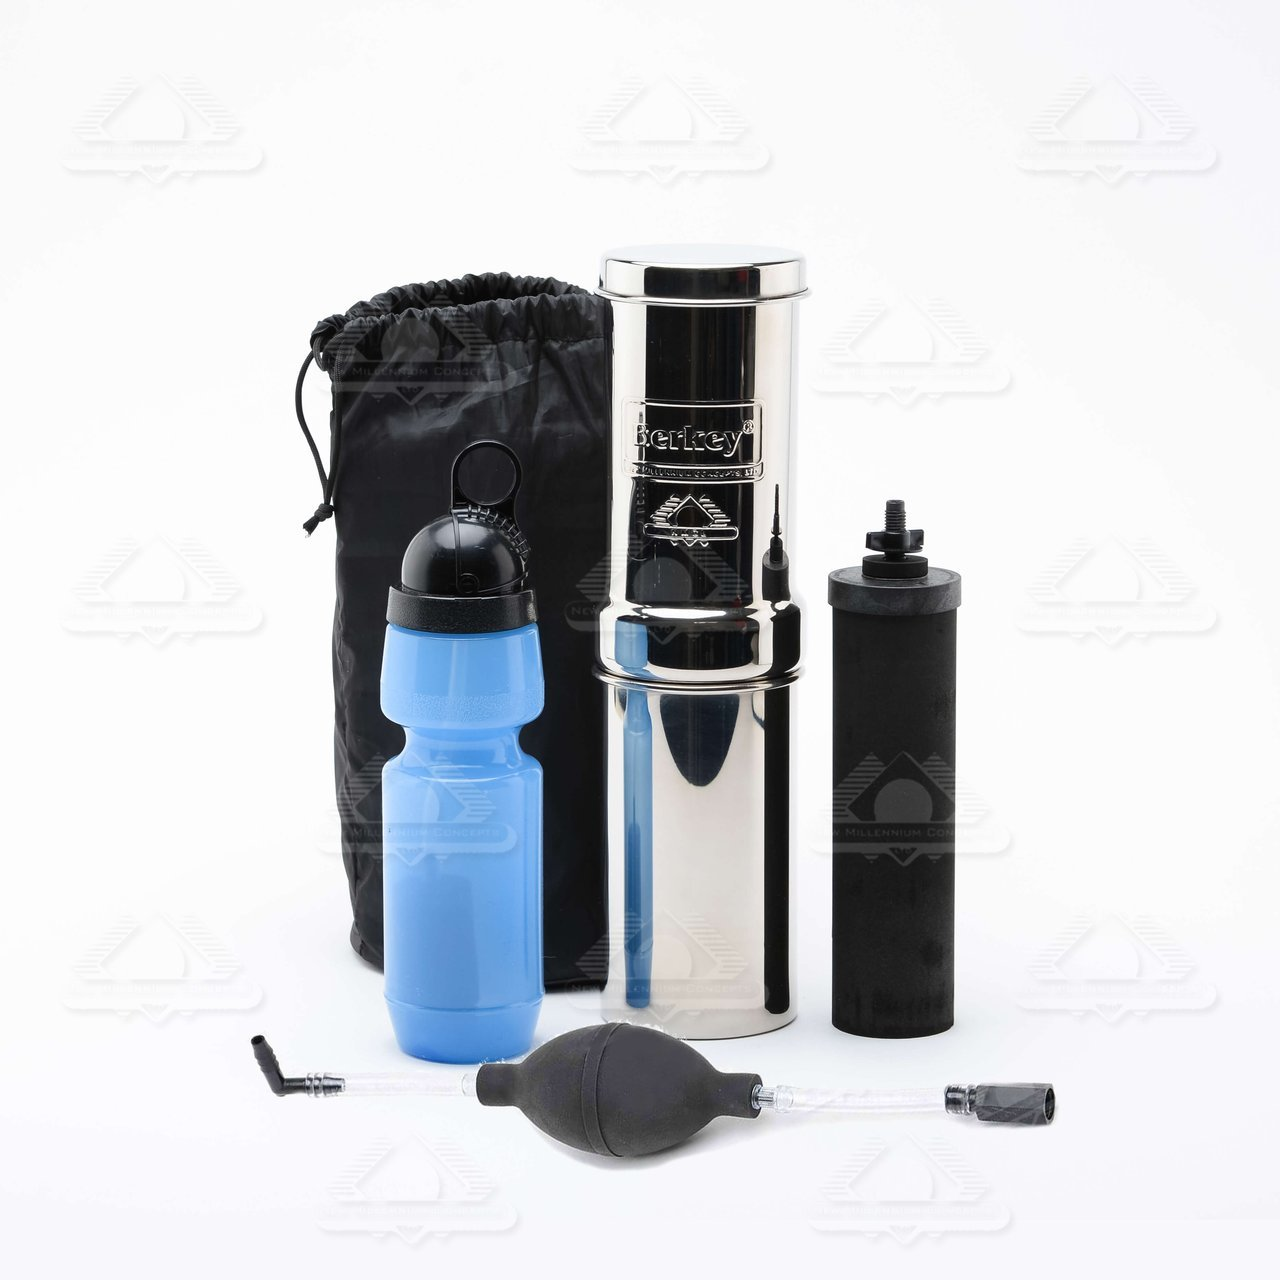 Go Berkey Kit (Includes Berkey Primer) -Stainless Steel Portable Water Filter System with Sport Berkey Water Bottle (Filter included) & a Vinyl Black Carrying Case GOBK-KIT